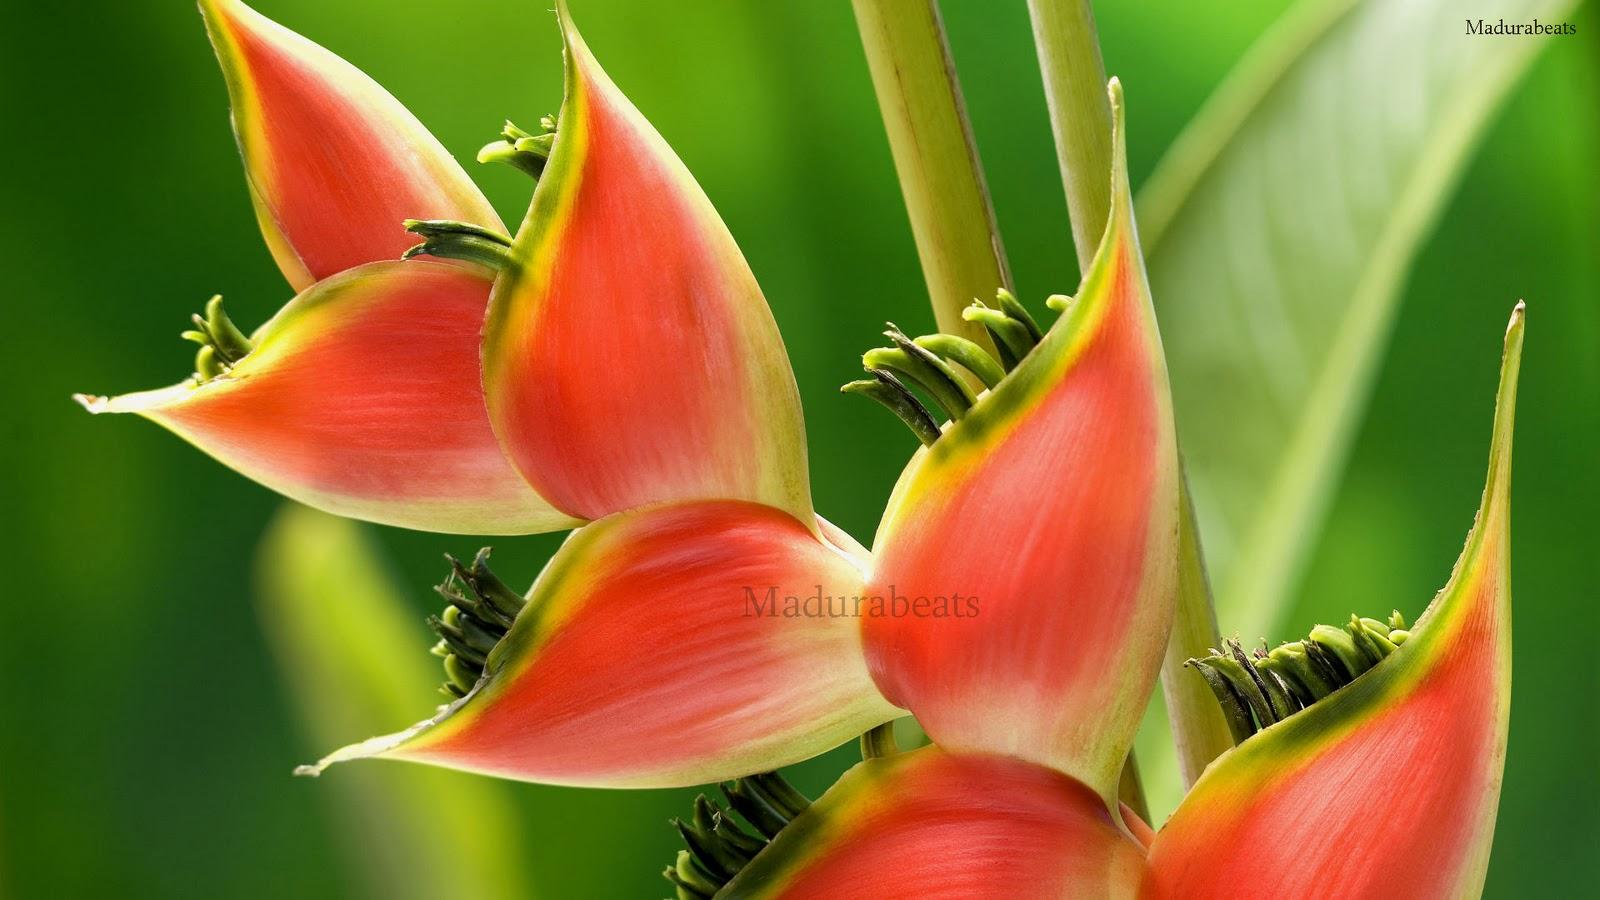 Flower images, Wide screen wallpapers,fresh flowers,Beautiful flowers,Tillandsia_Green_Background_hd_wallpaper